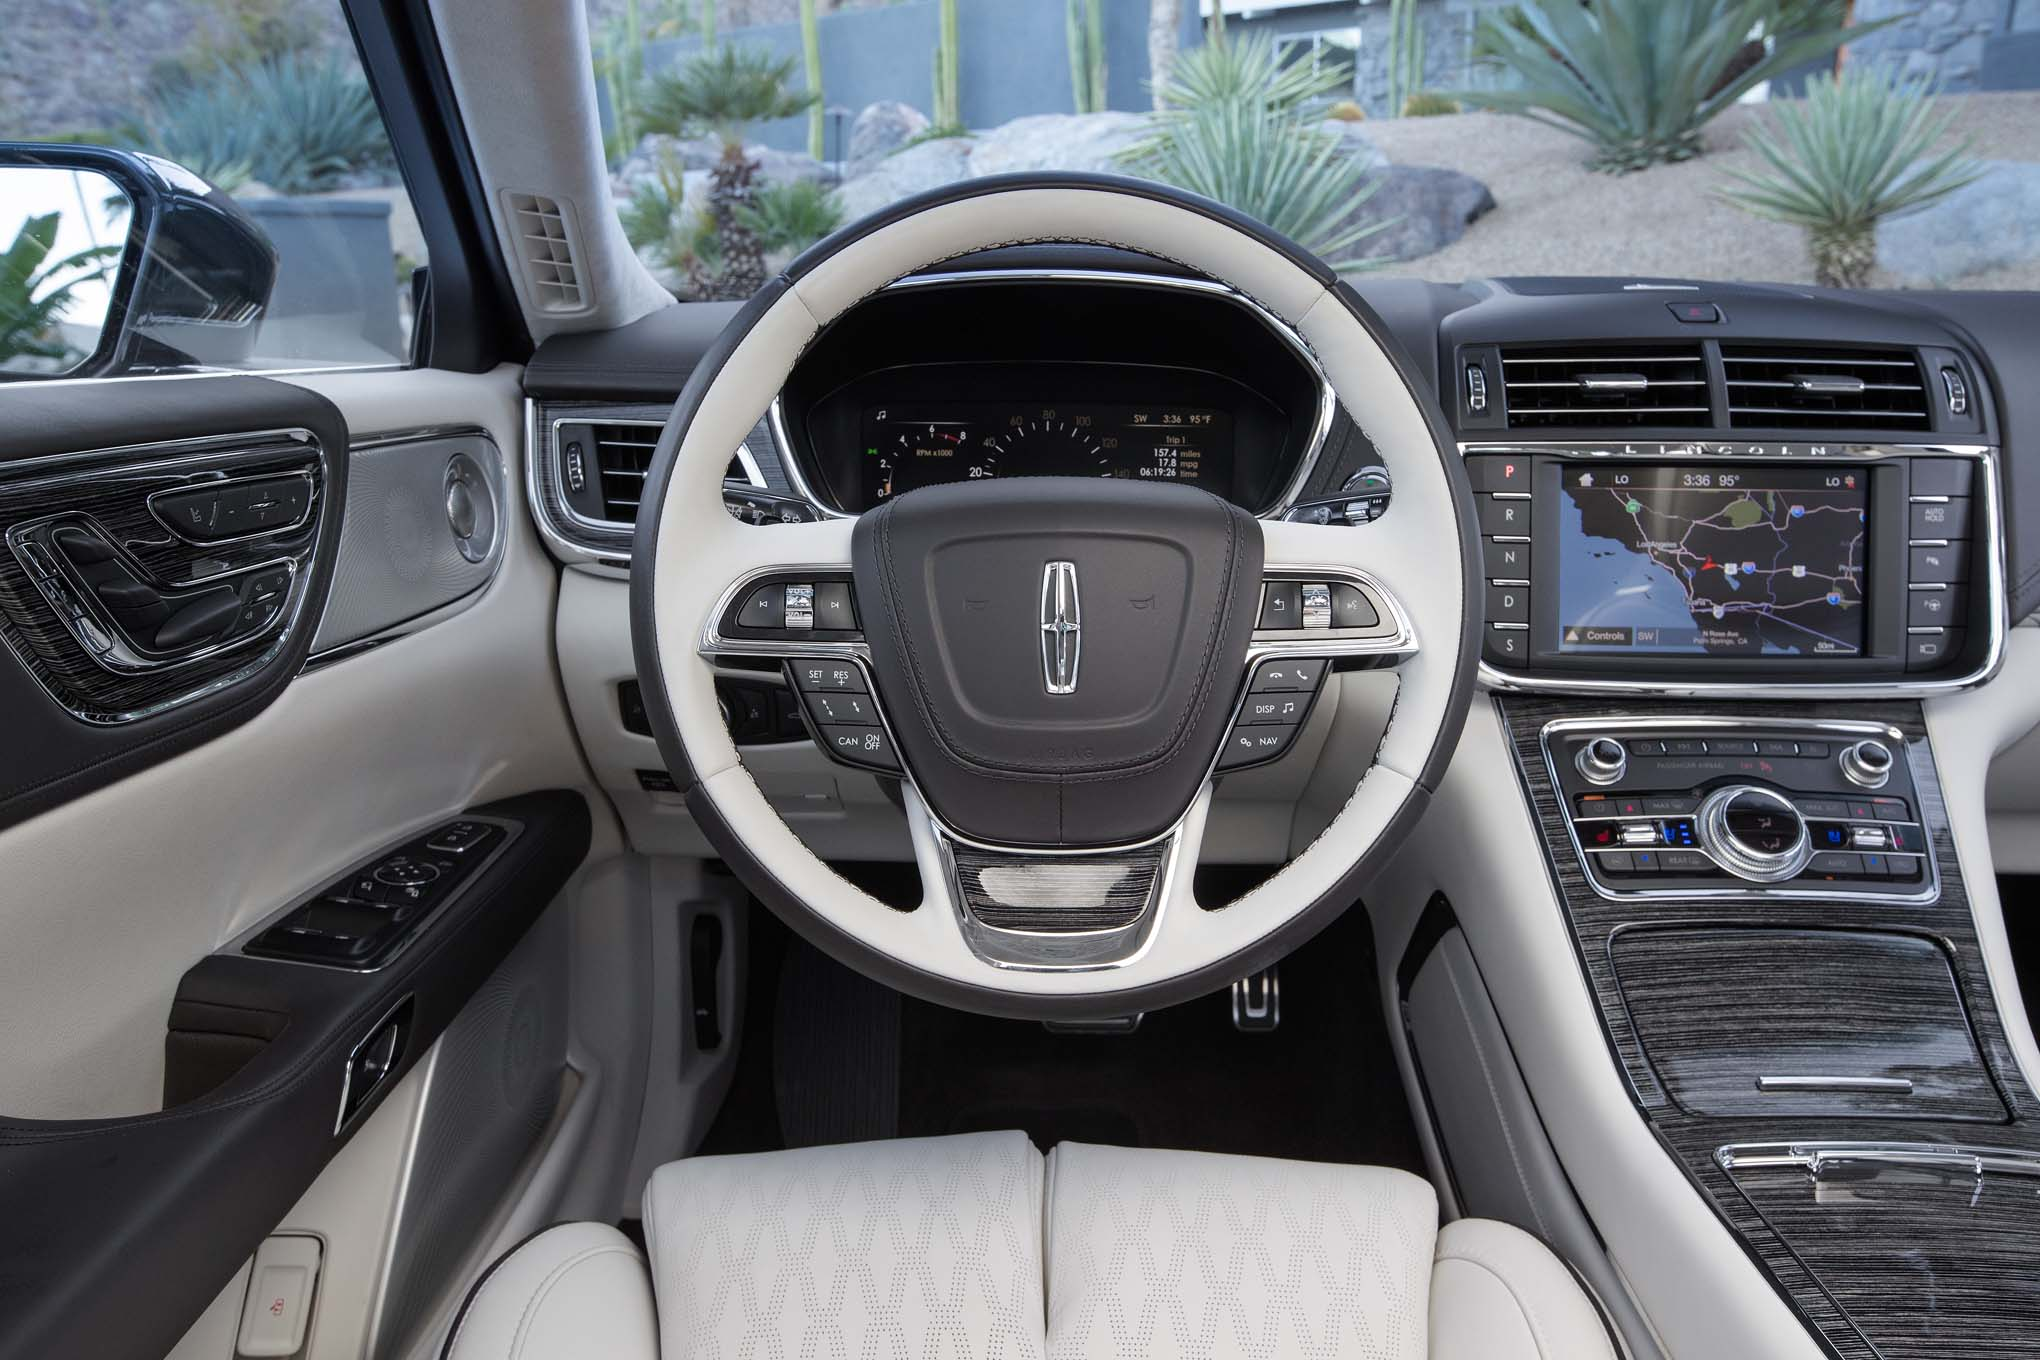 2017-Lincoln-Continental-30T-AWD-cockpit.jpg